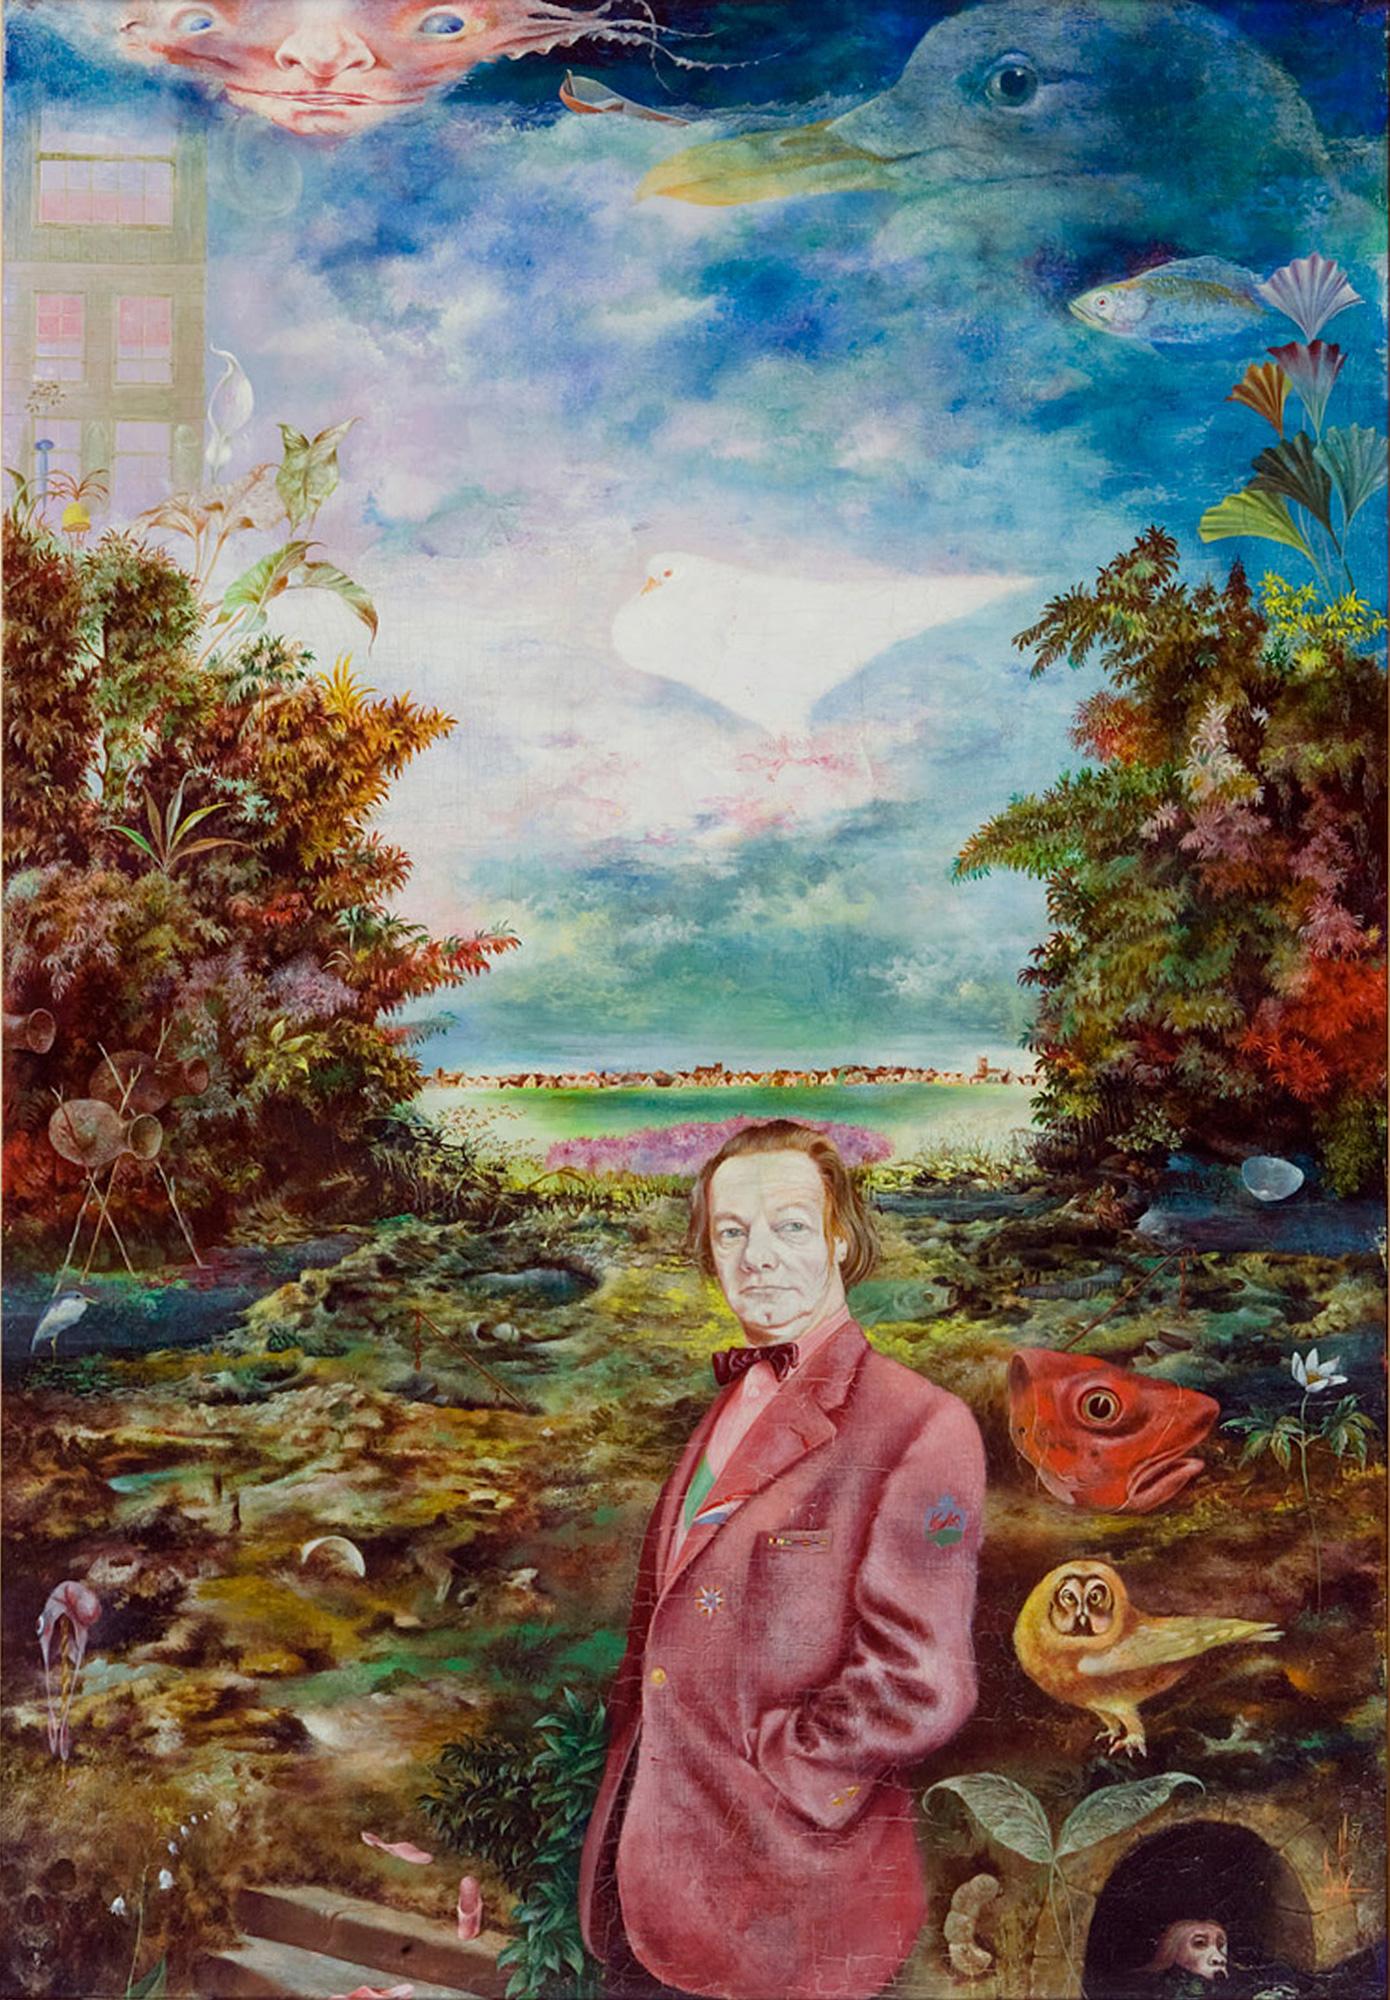 Melle schilder | Zelfportret, olieverf op linnen